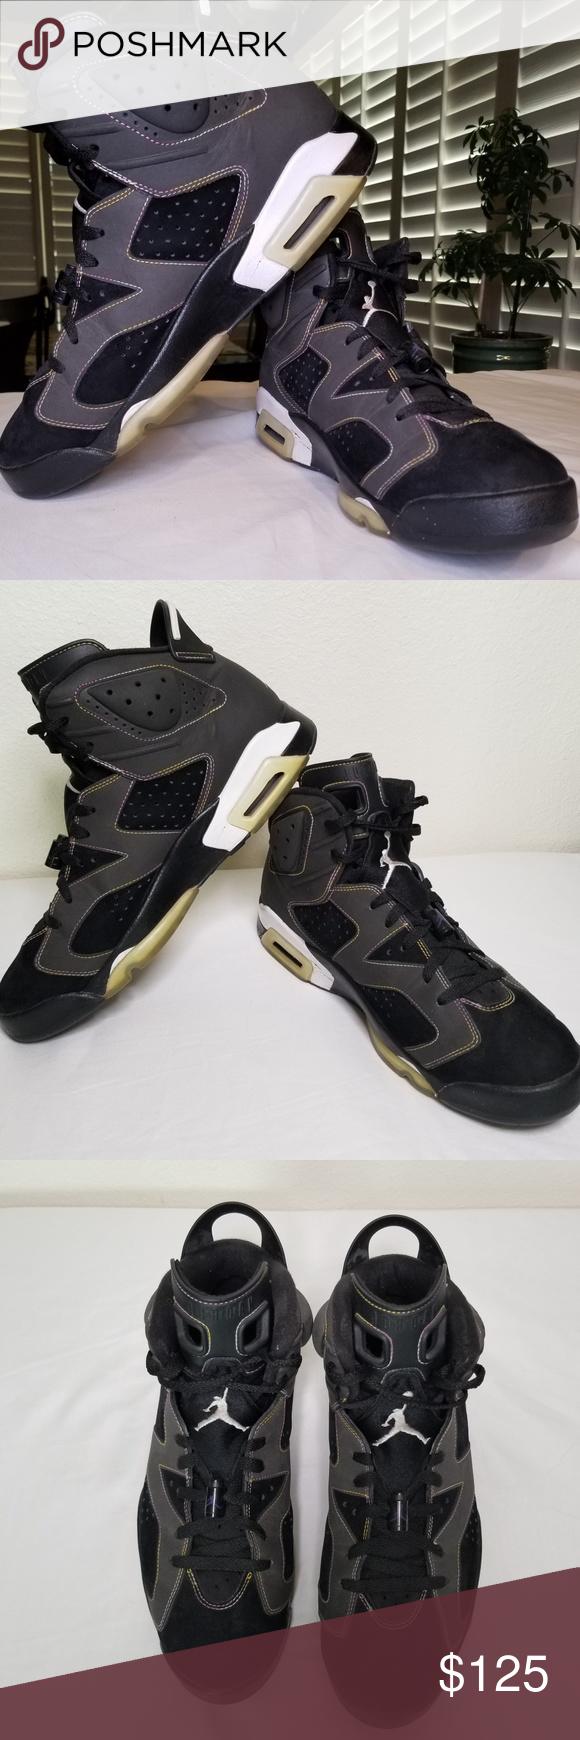 adfff68363c4 Air Jordan 6 Retro  Lakers  2010 Nike Air Jordan 6 Retro  Lakers ...